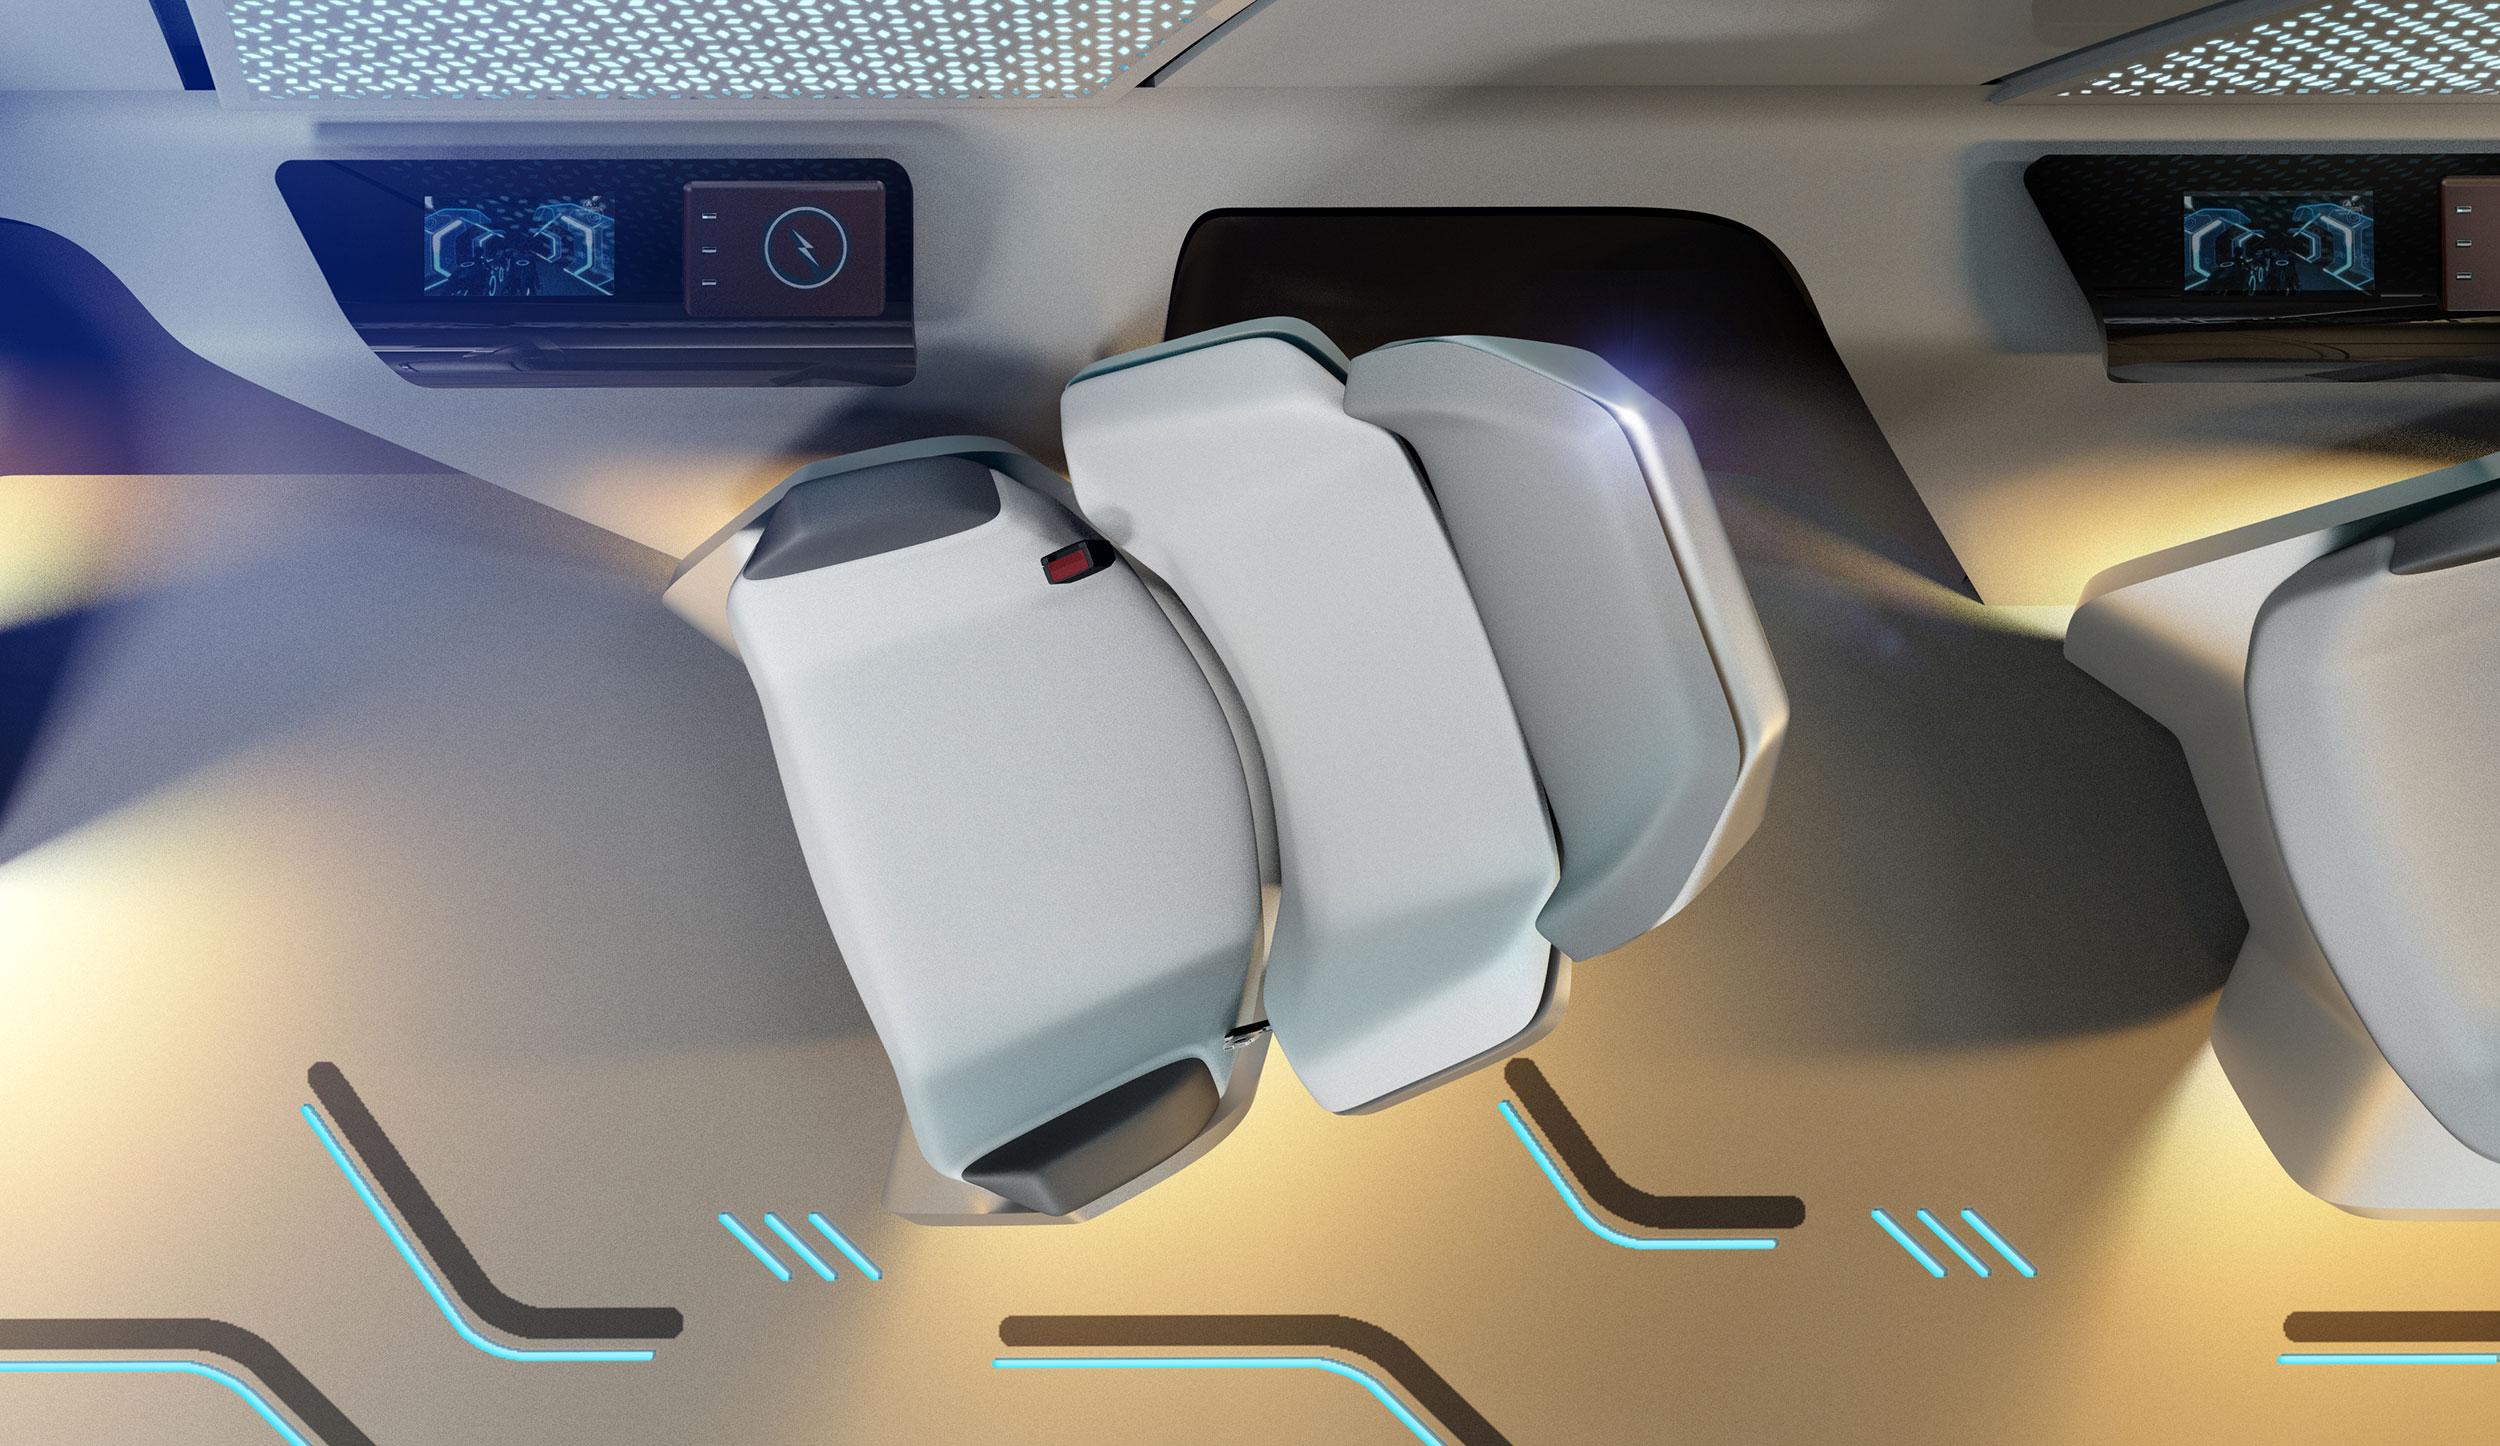 hyperloop seat from the top